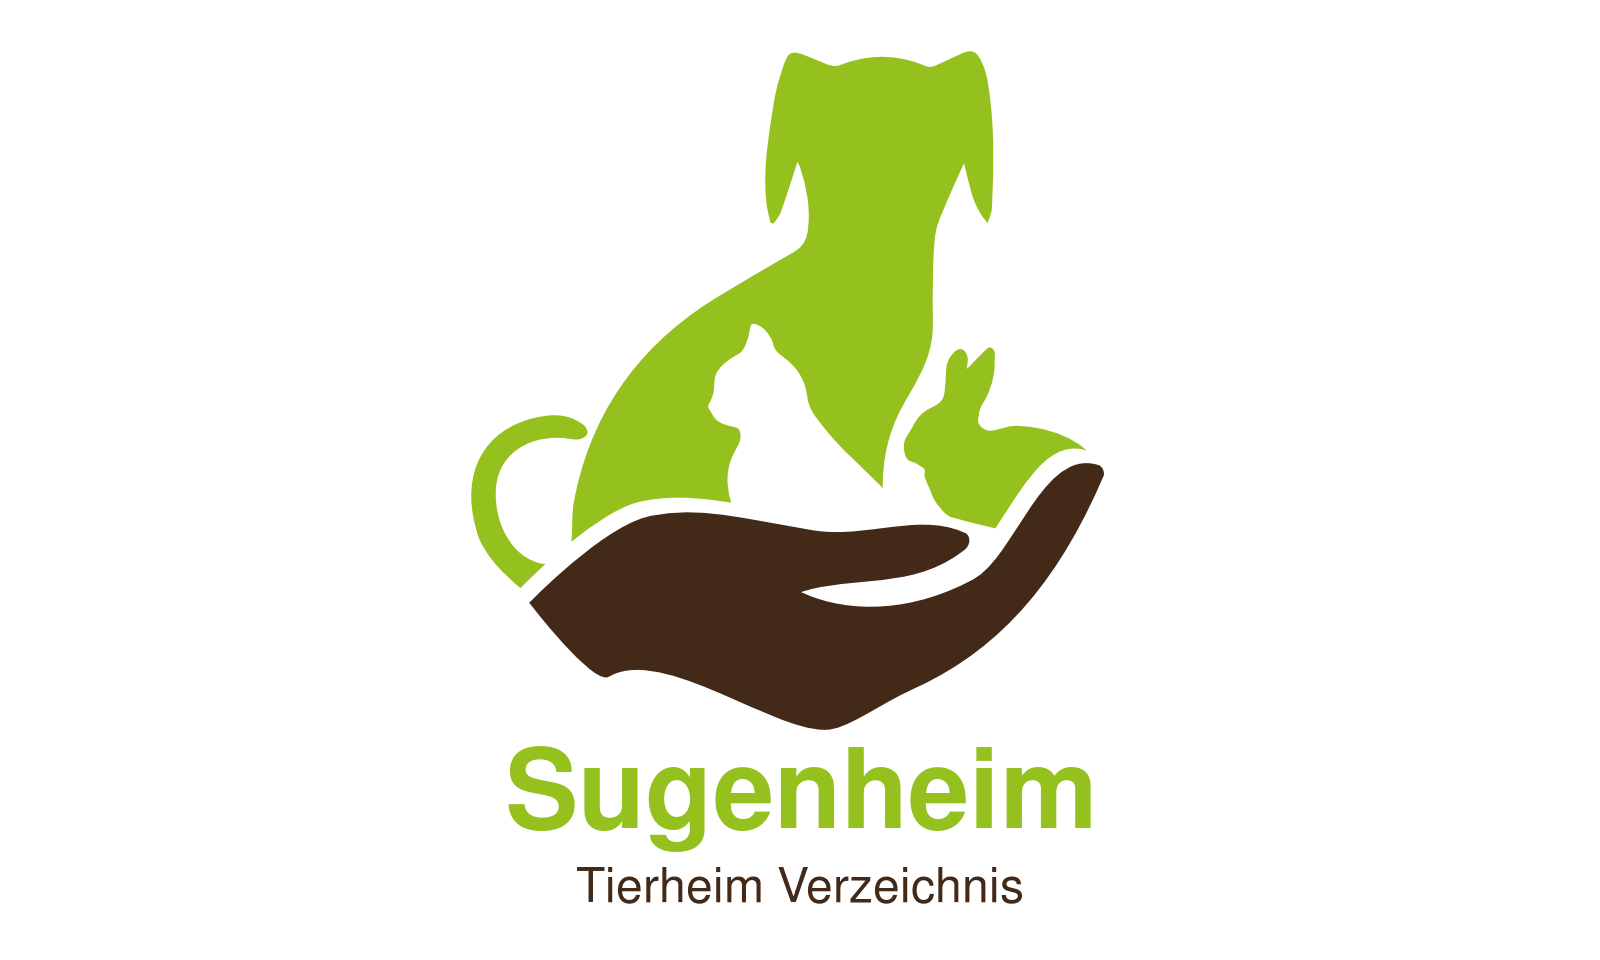 Tierheim Sugenheim